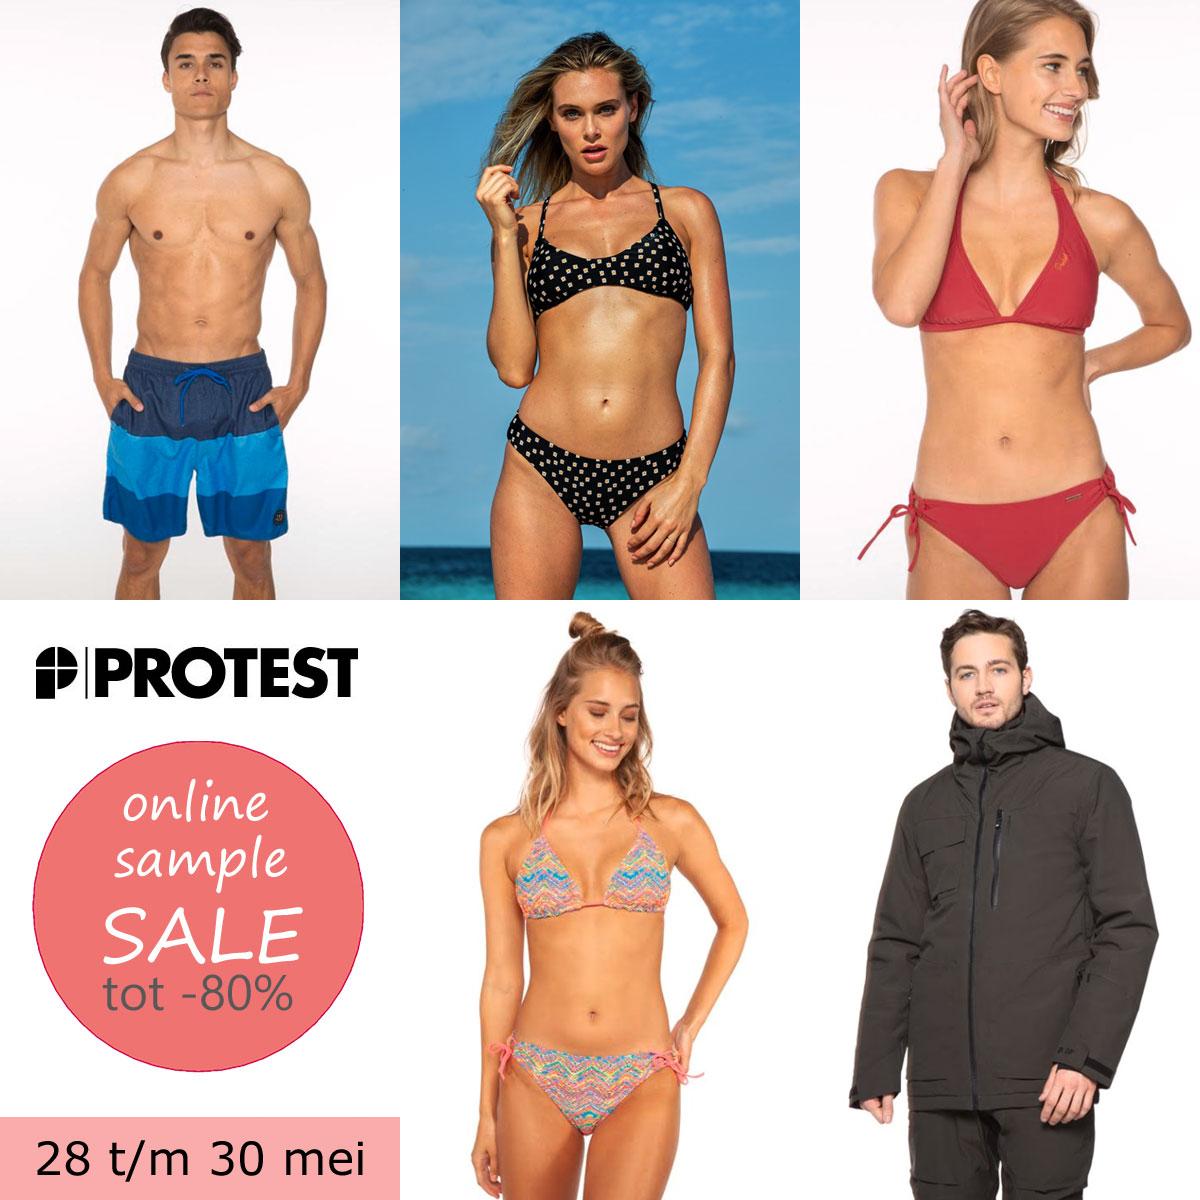 PROTEST sample sale: tot 80% korting [va 28 mei · nu inschrijven = straks shoppen]